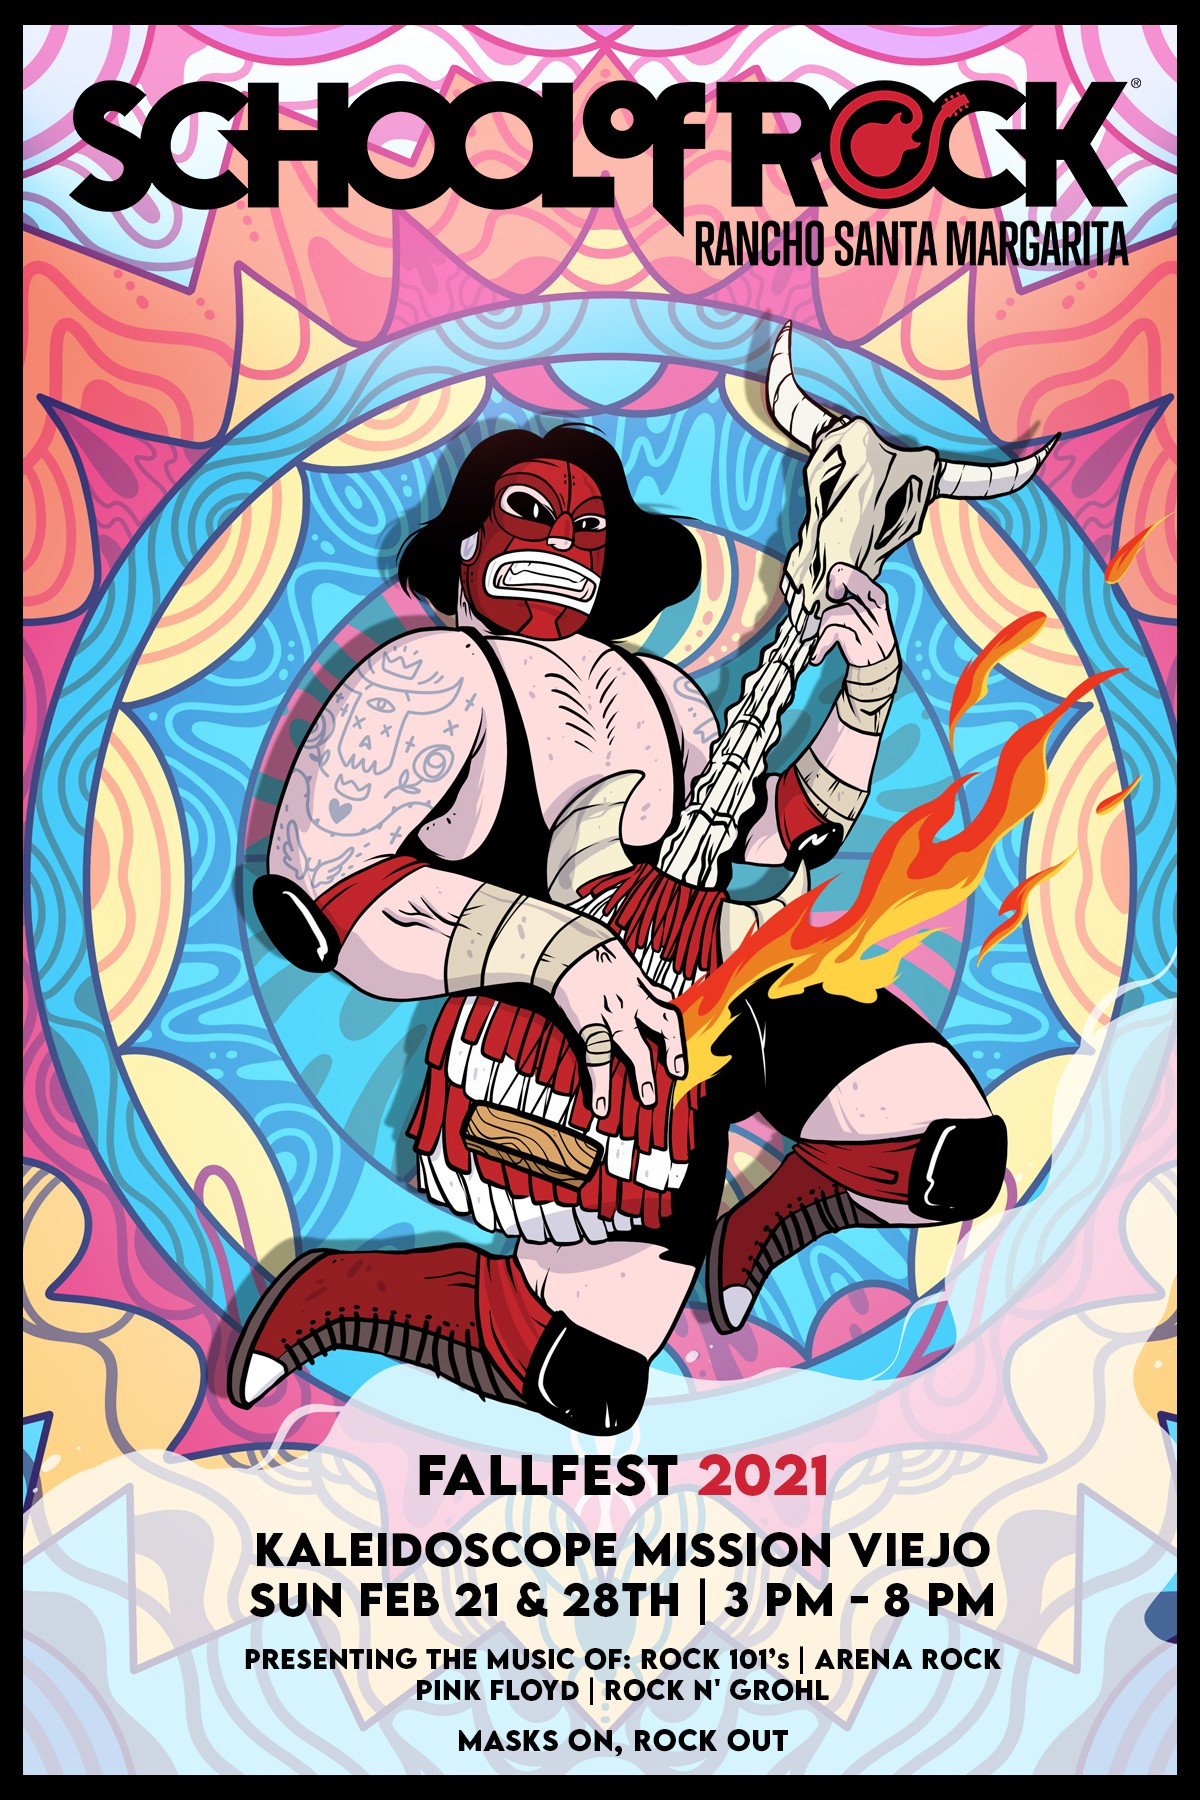 Show Poster - Fallfest 2021 - School of Rock Rancho Santa Margarita